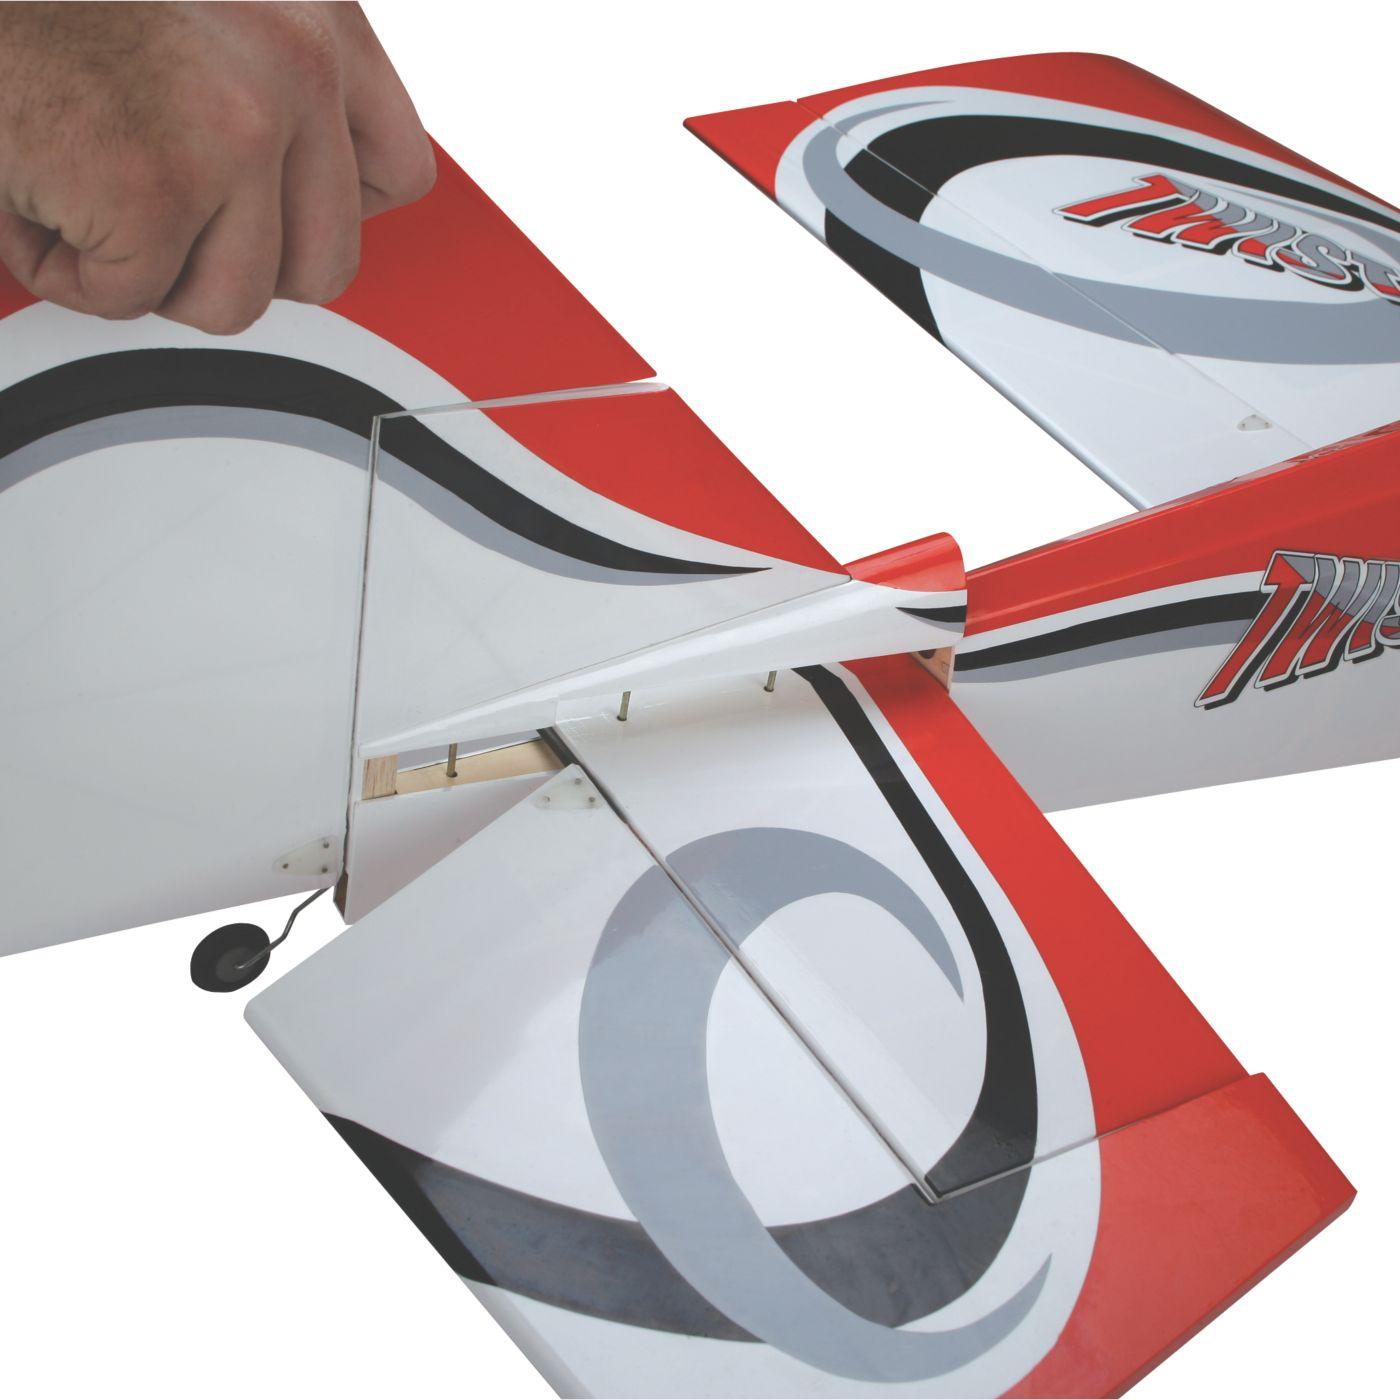 Twist hangar 9